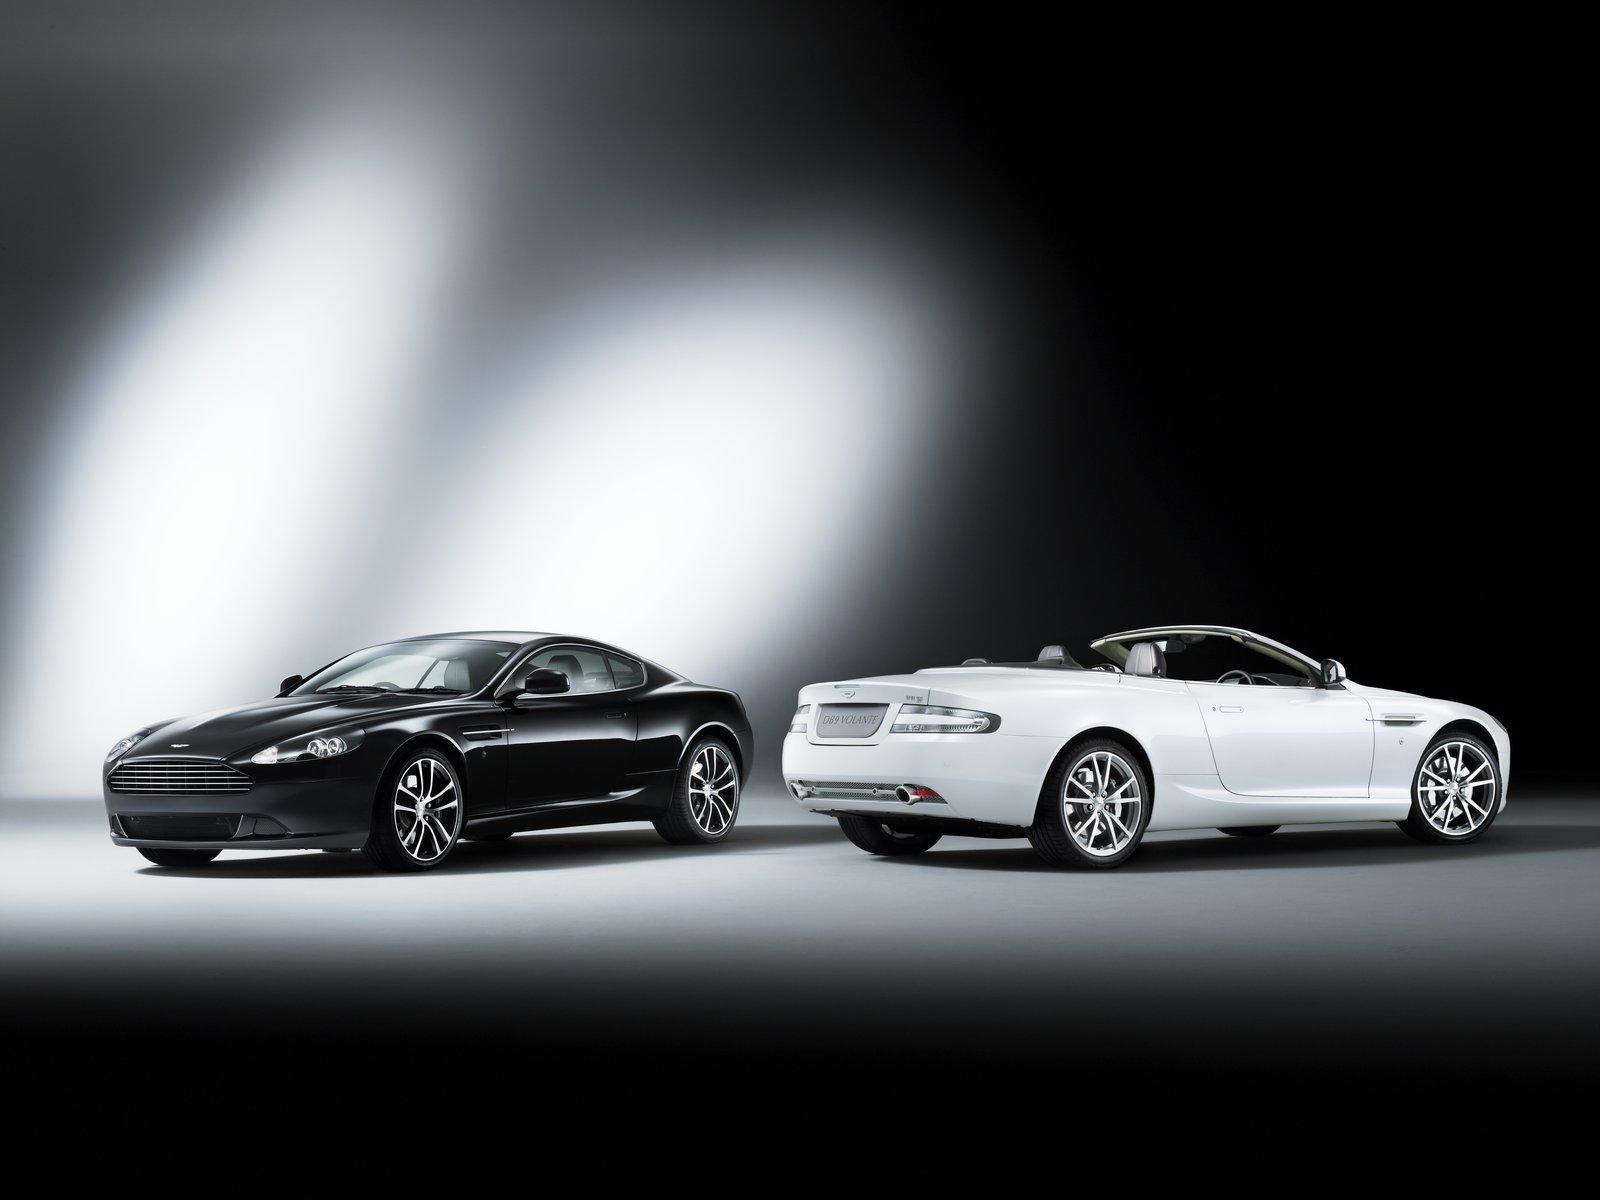 Aston Martin DB9 Carbon Black and DB9 Morning Frost